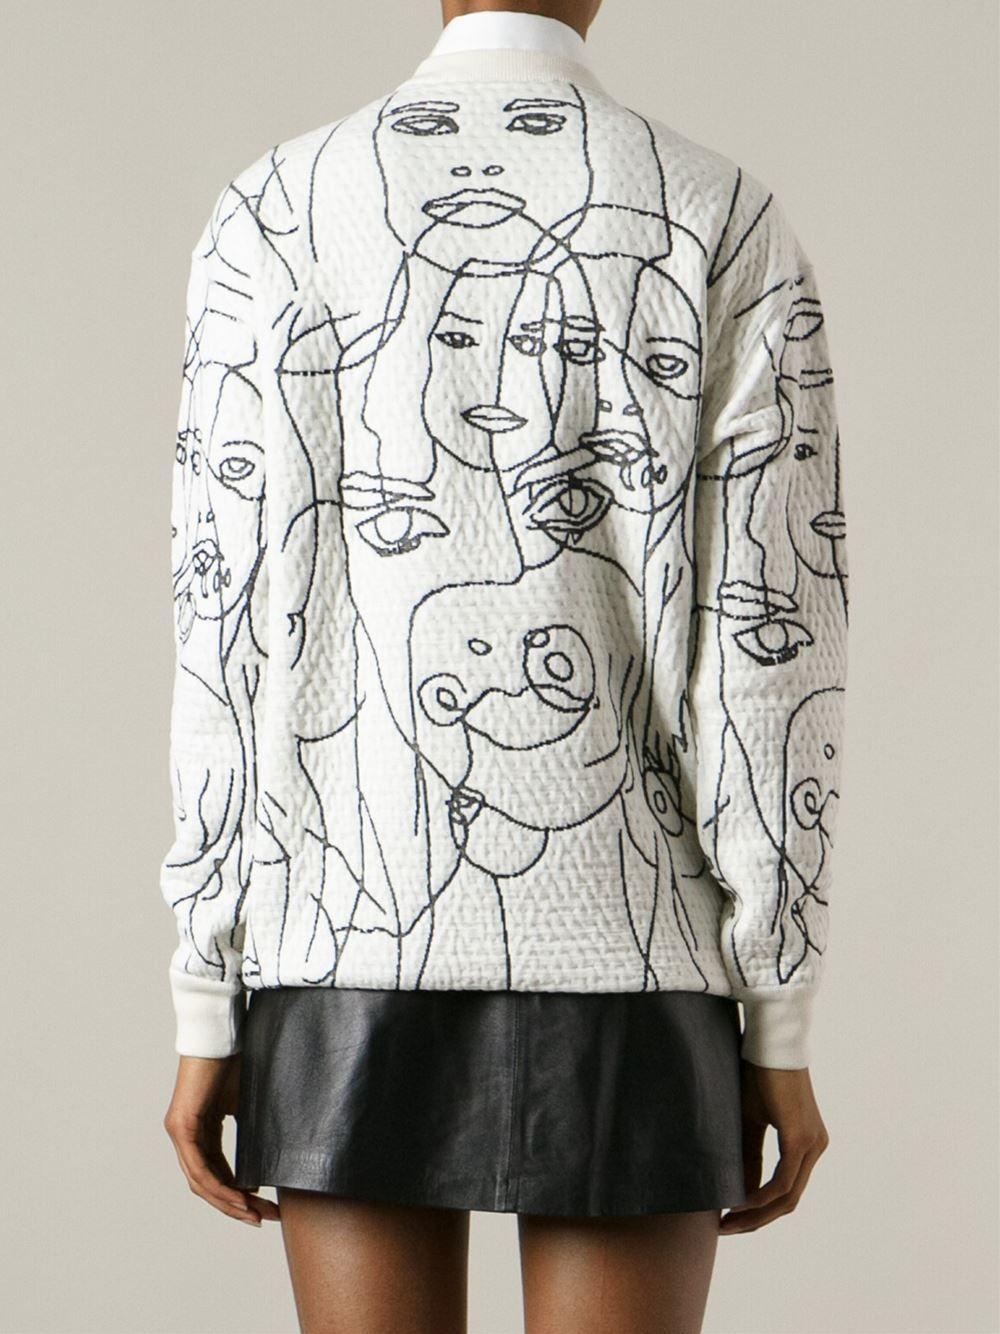 Stella McCartney embroidered faces sweatshirt